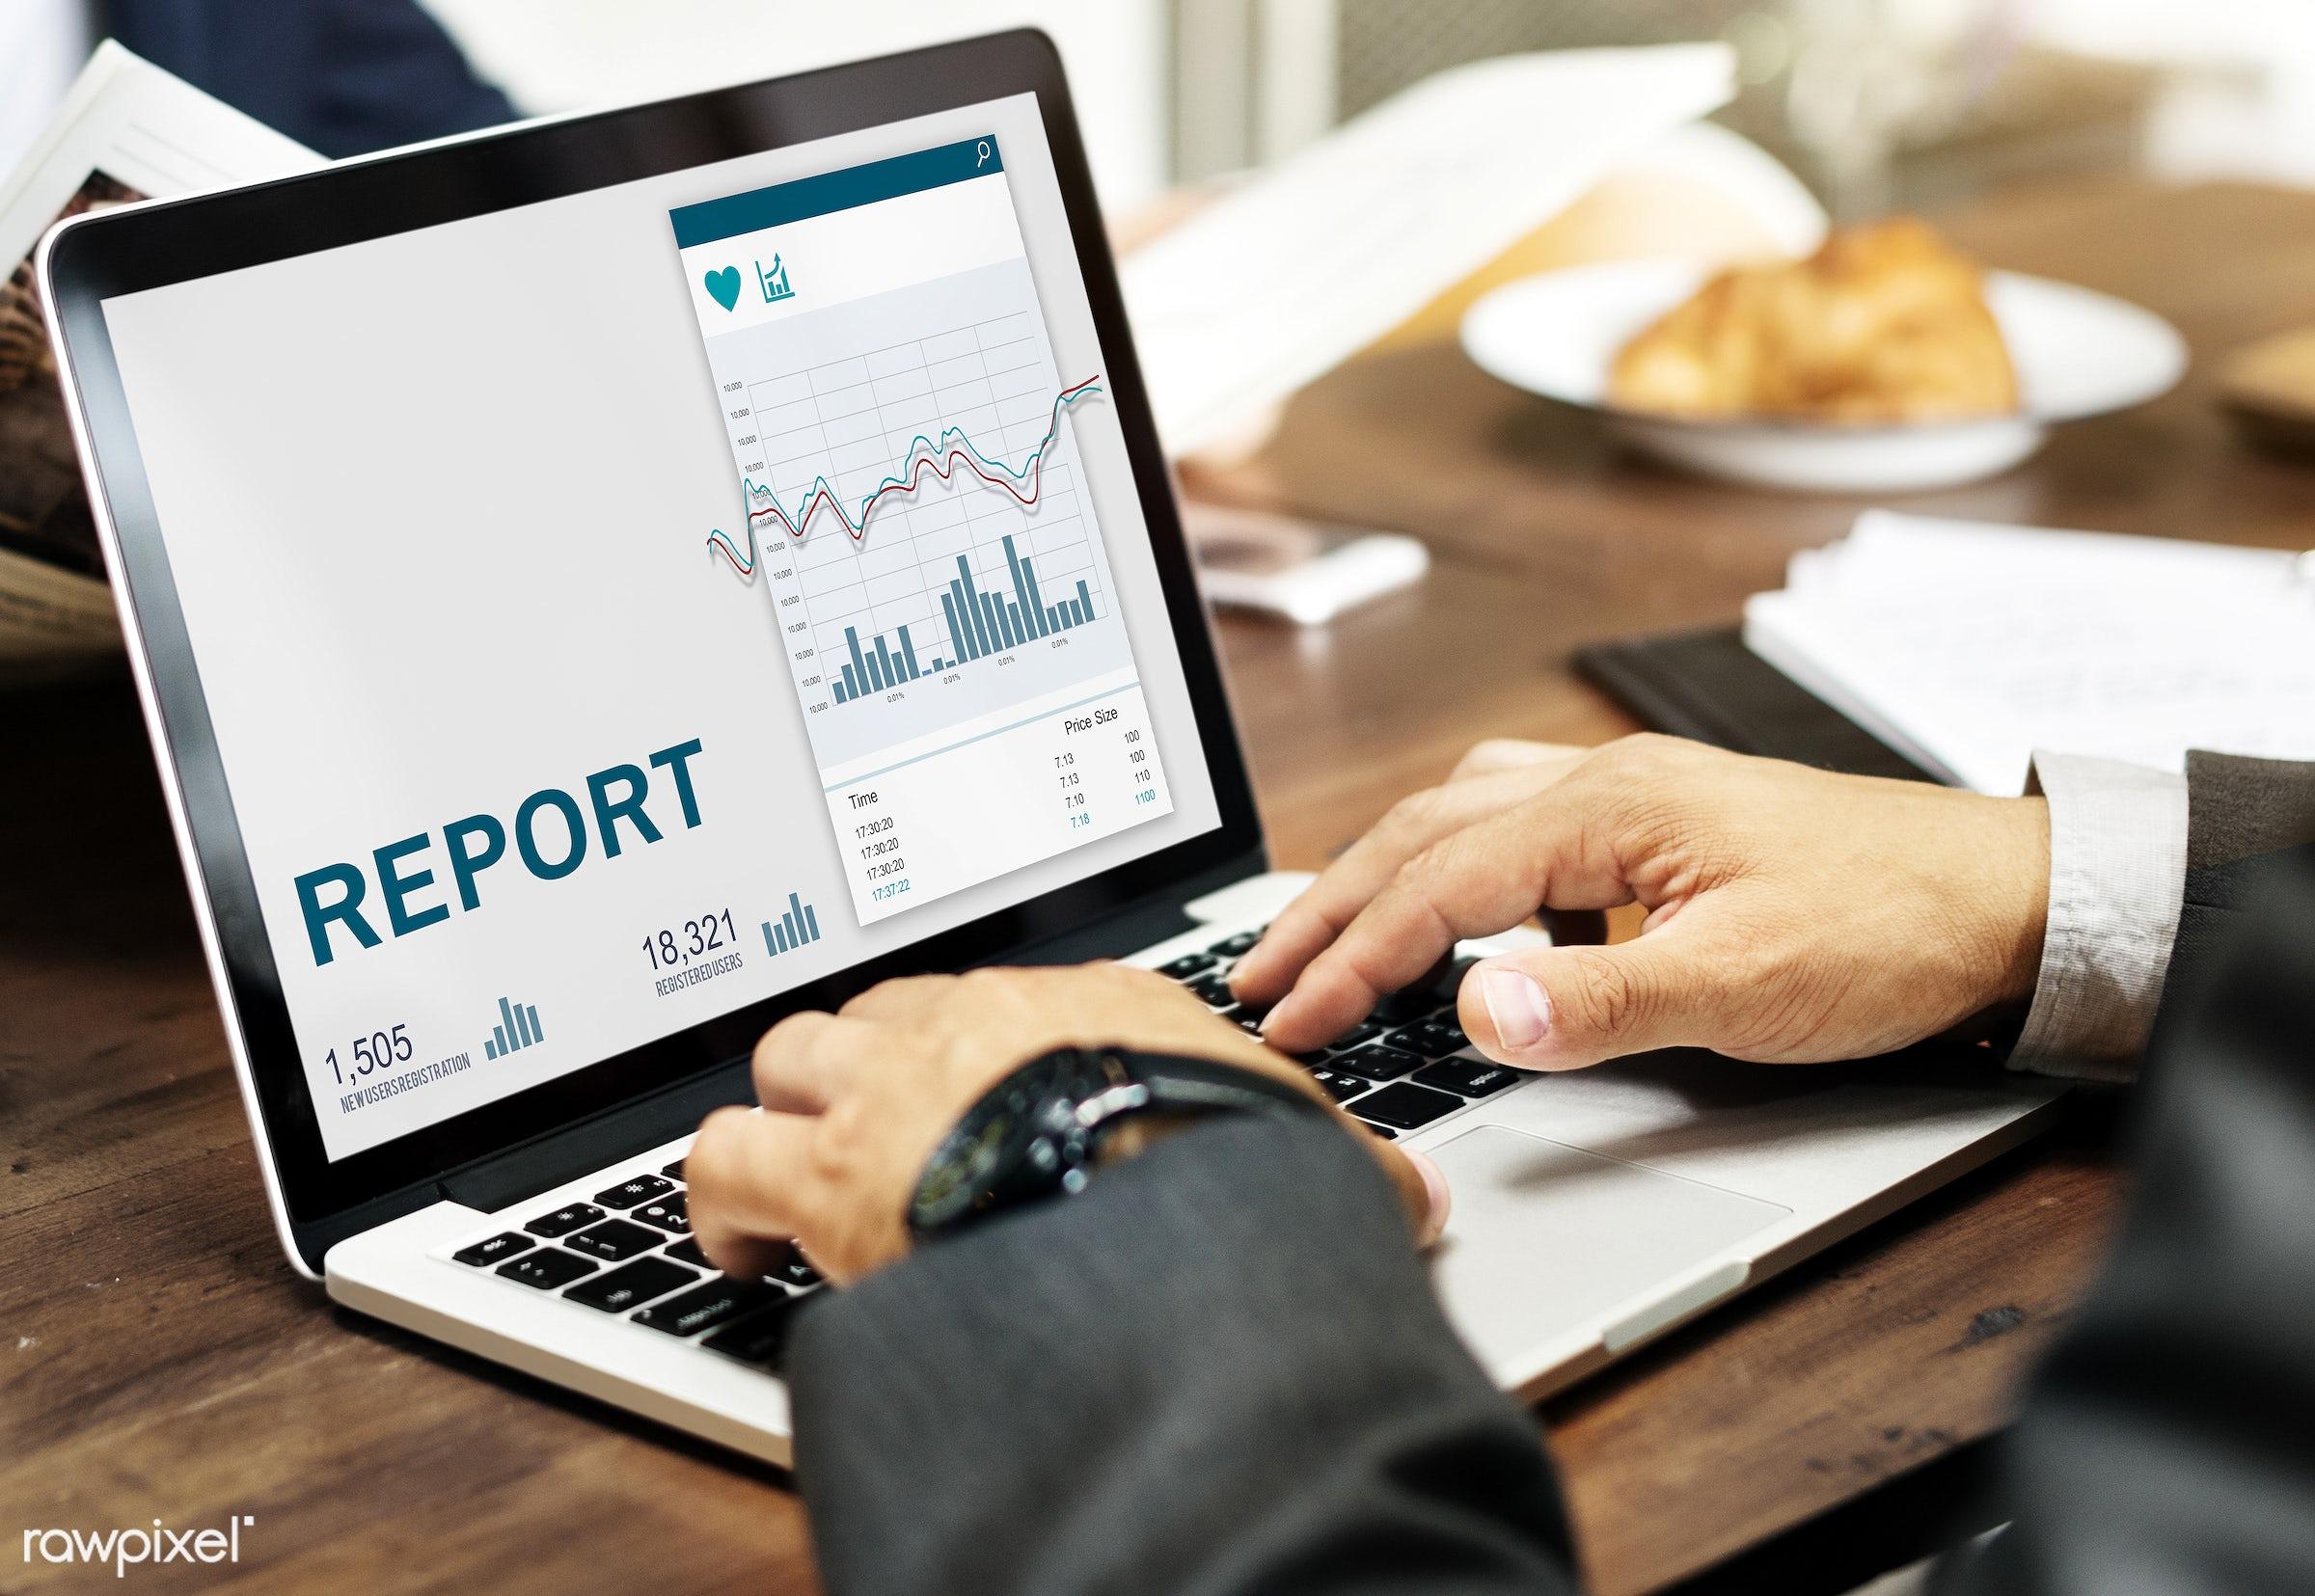 achievement, browse, business, businessman, cafe, connection, control, corporate, data, device, digital, digital device,...